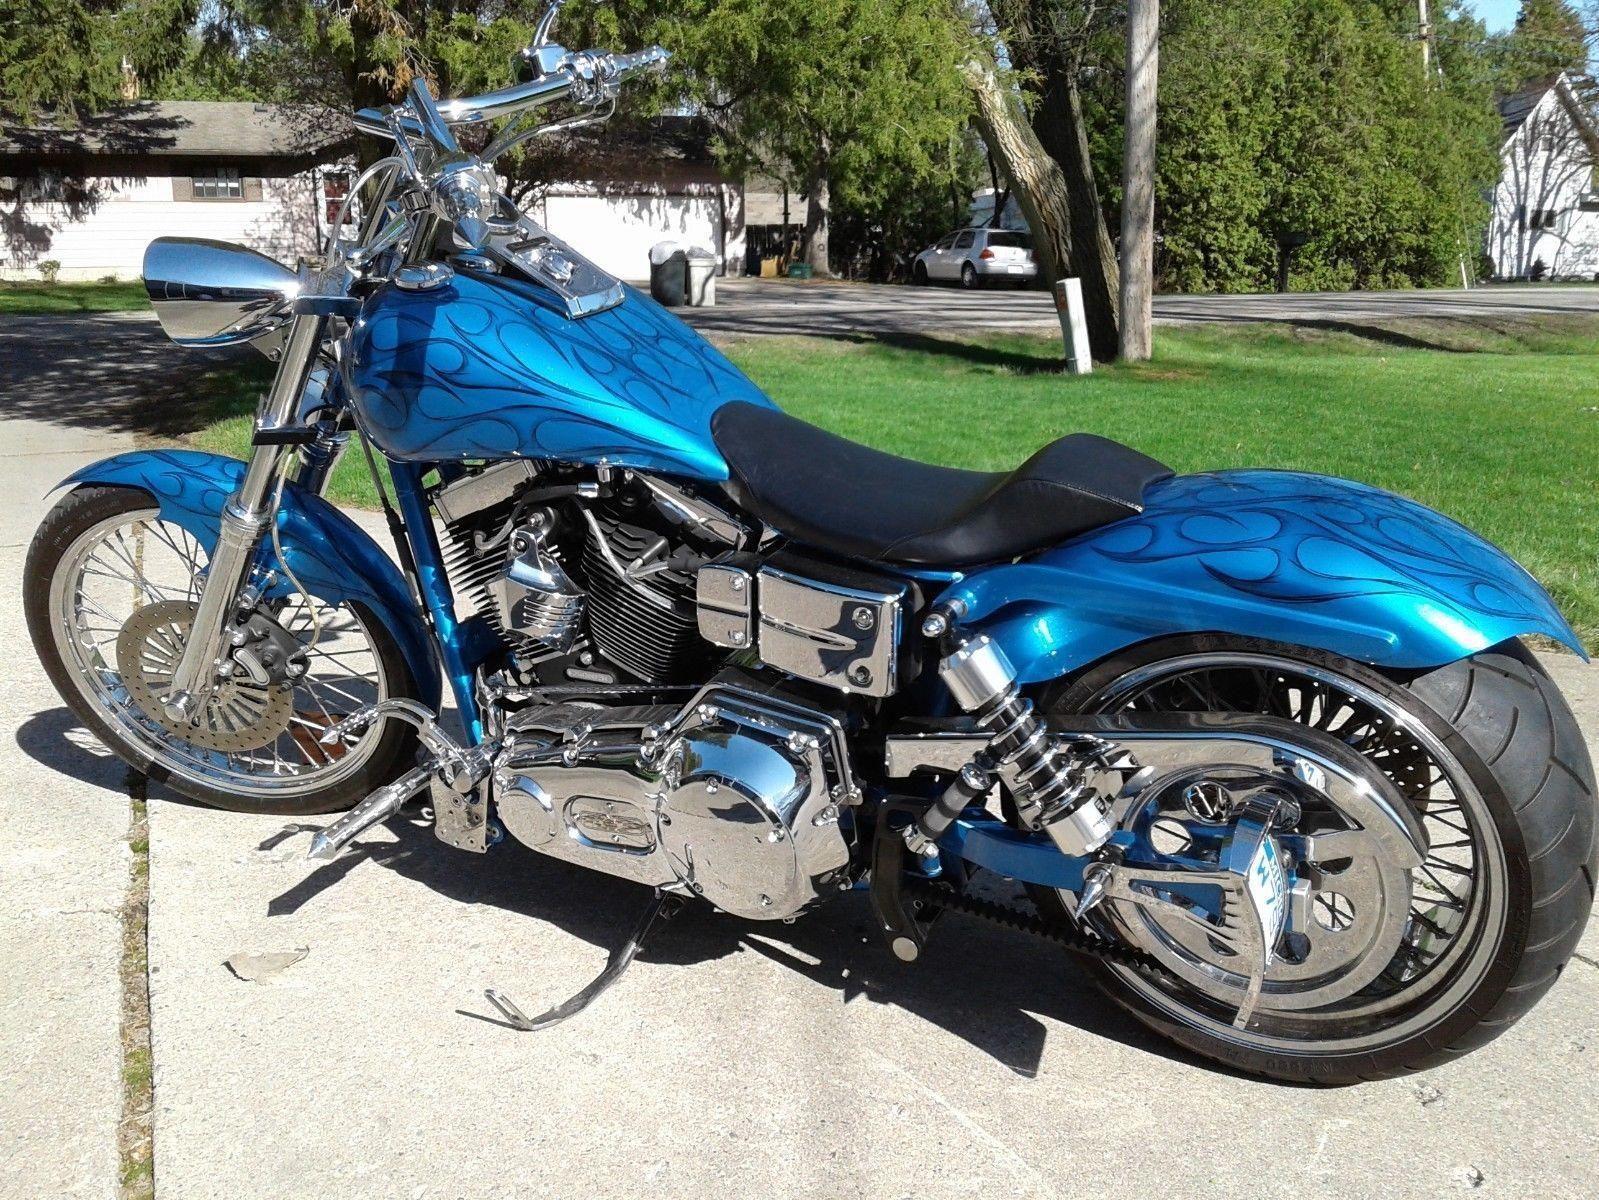 eBay: 2004 Harley-Davidson Dyna Harley Davidson Dyna-Wide